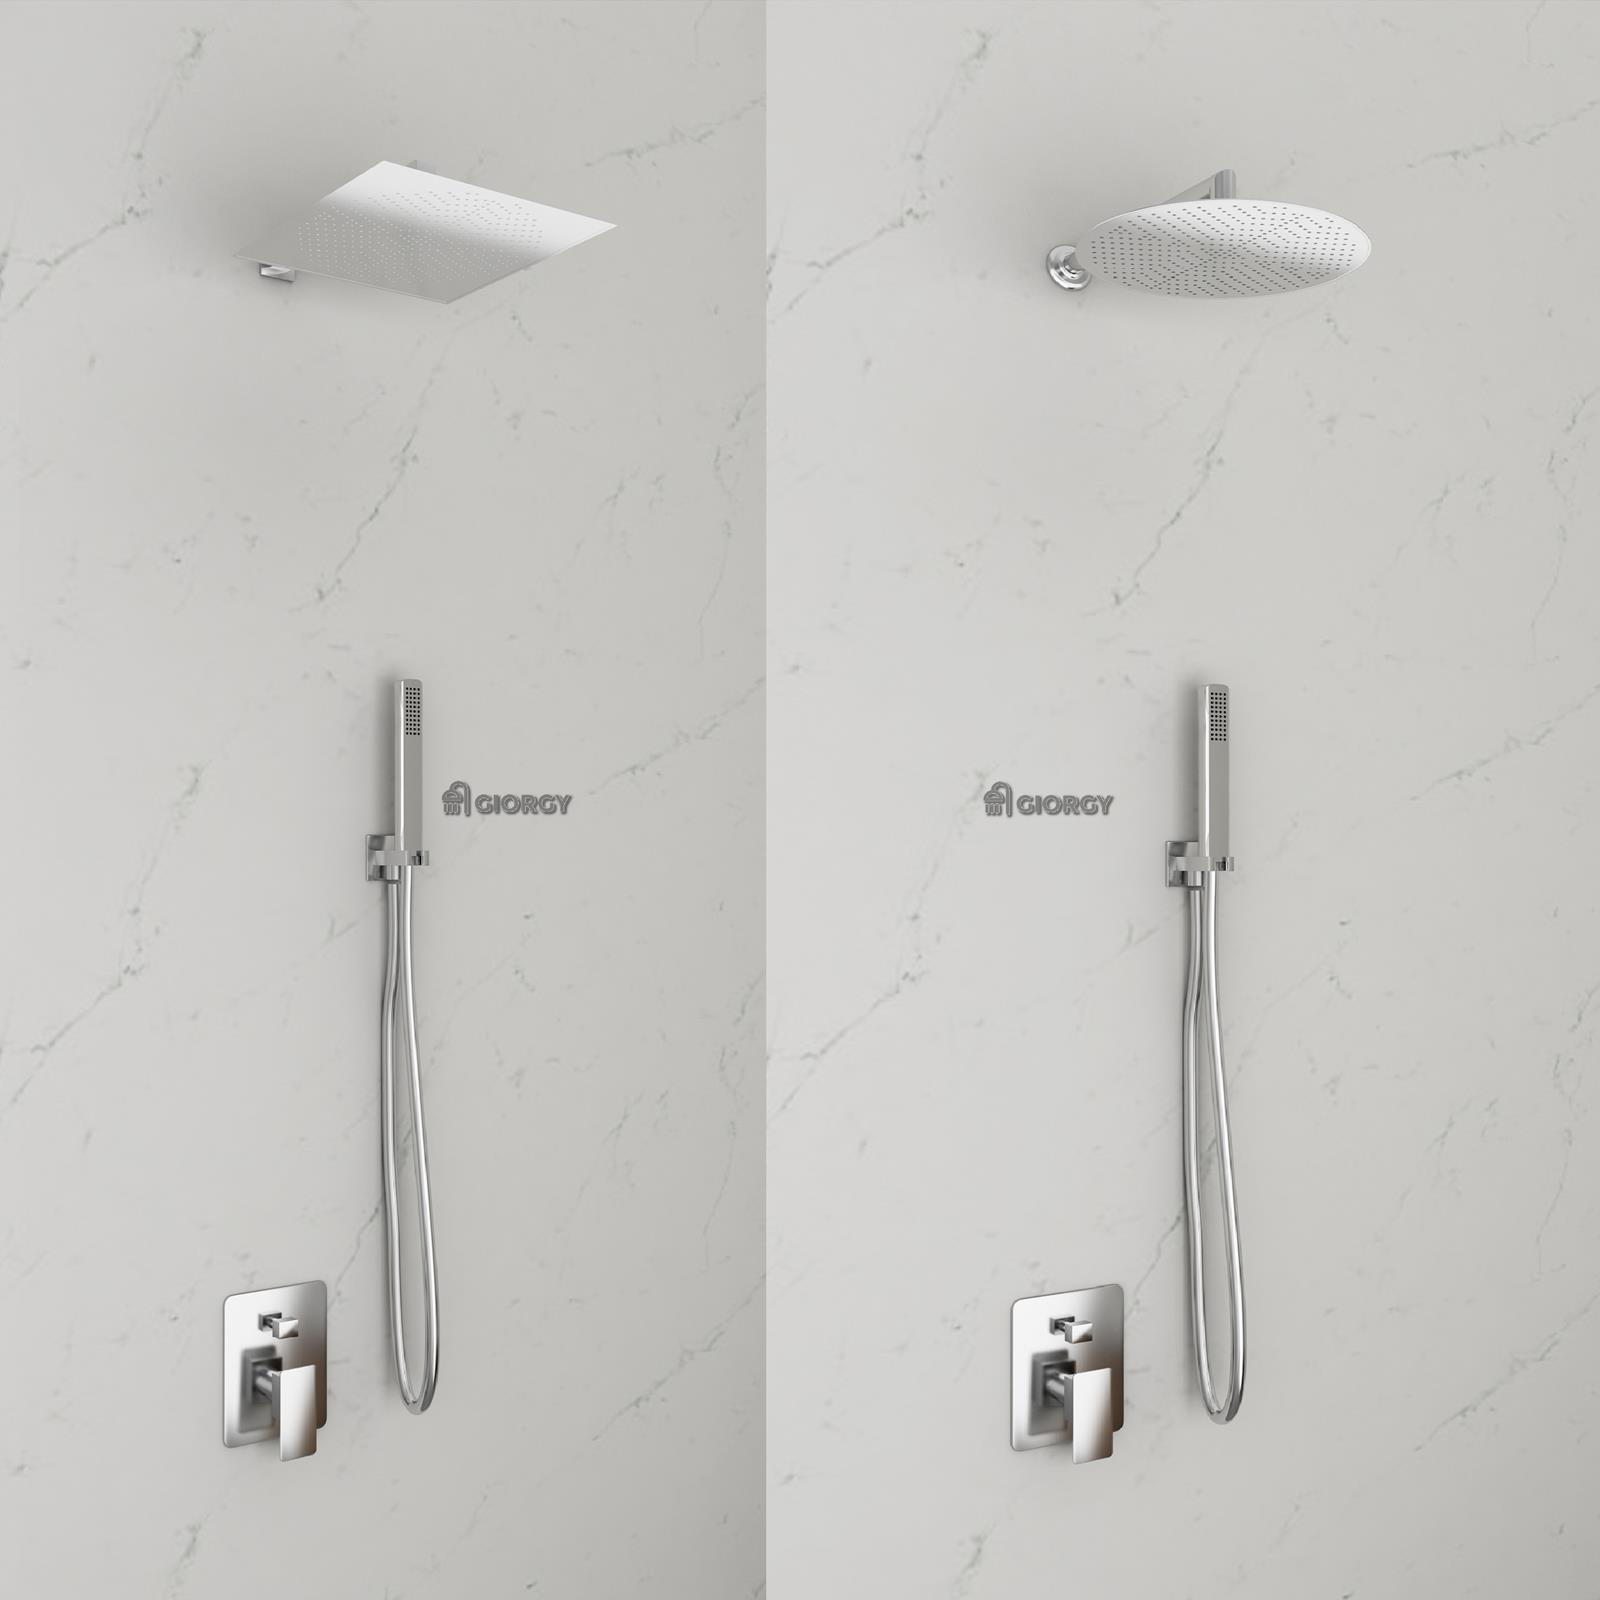 Kit doccia soffione inox slim braccio doccia miscelatore da incasso presa acqua ebay - Soffione doccia da incasso ...